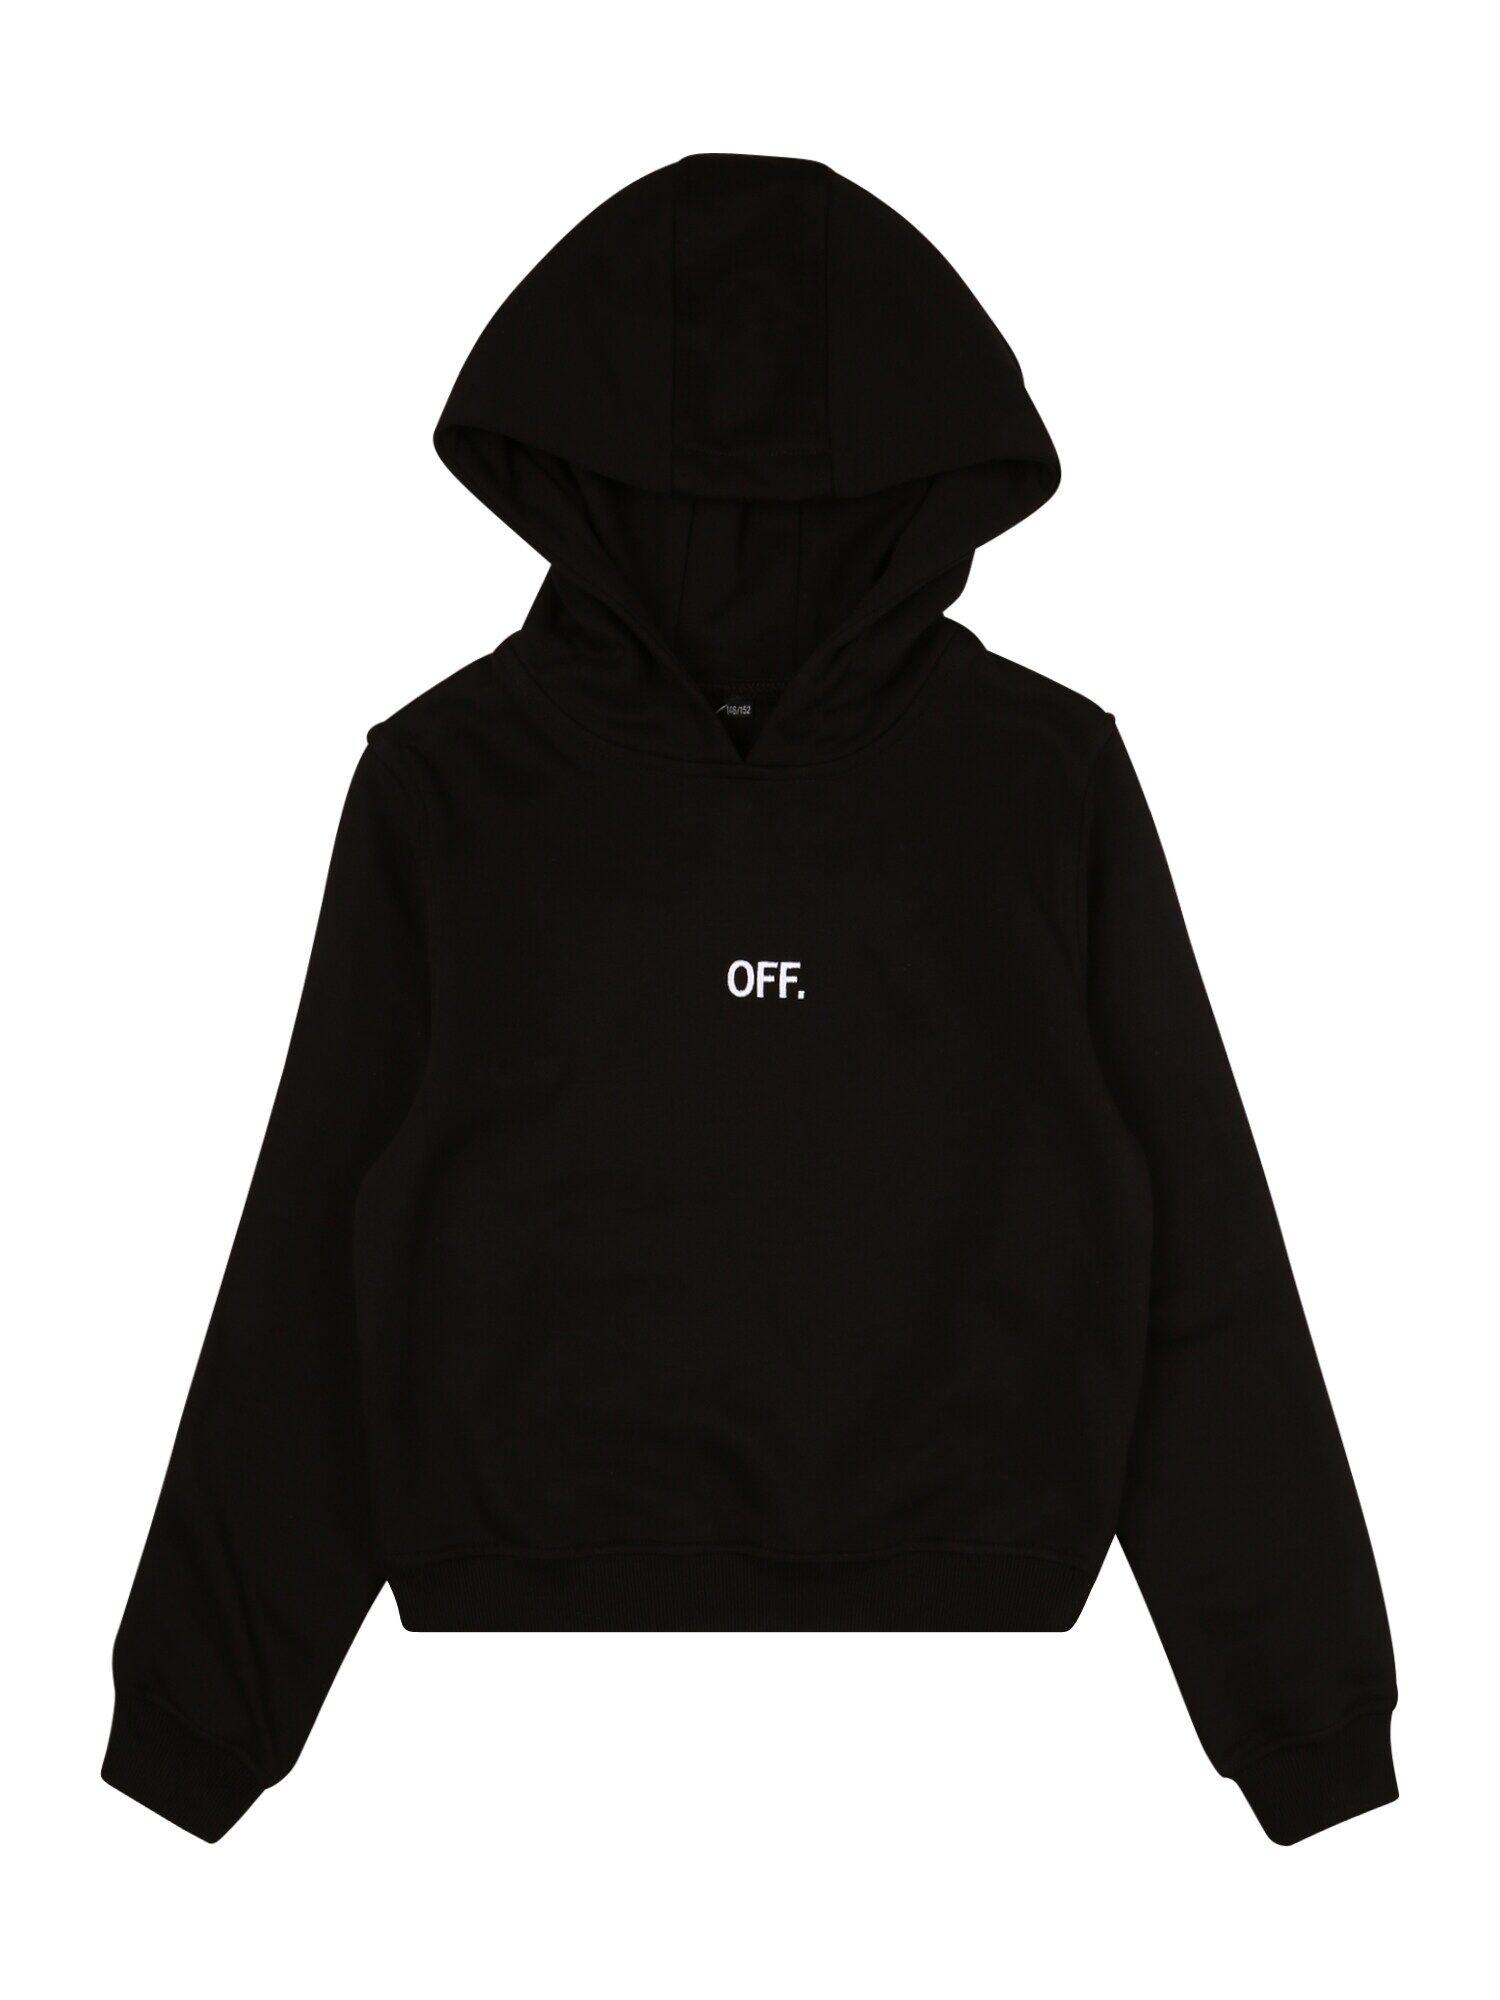 Tee Sweat 'OFF'  - Noir - Taille: 122-128 - boy